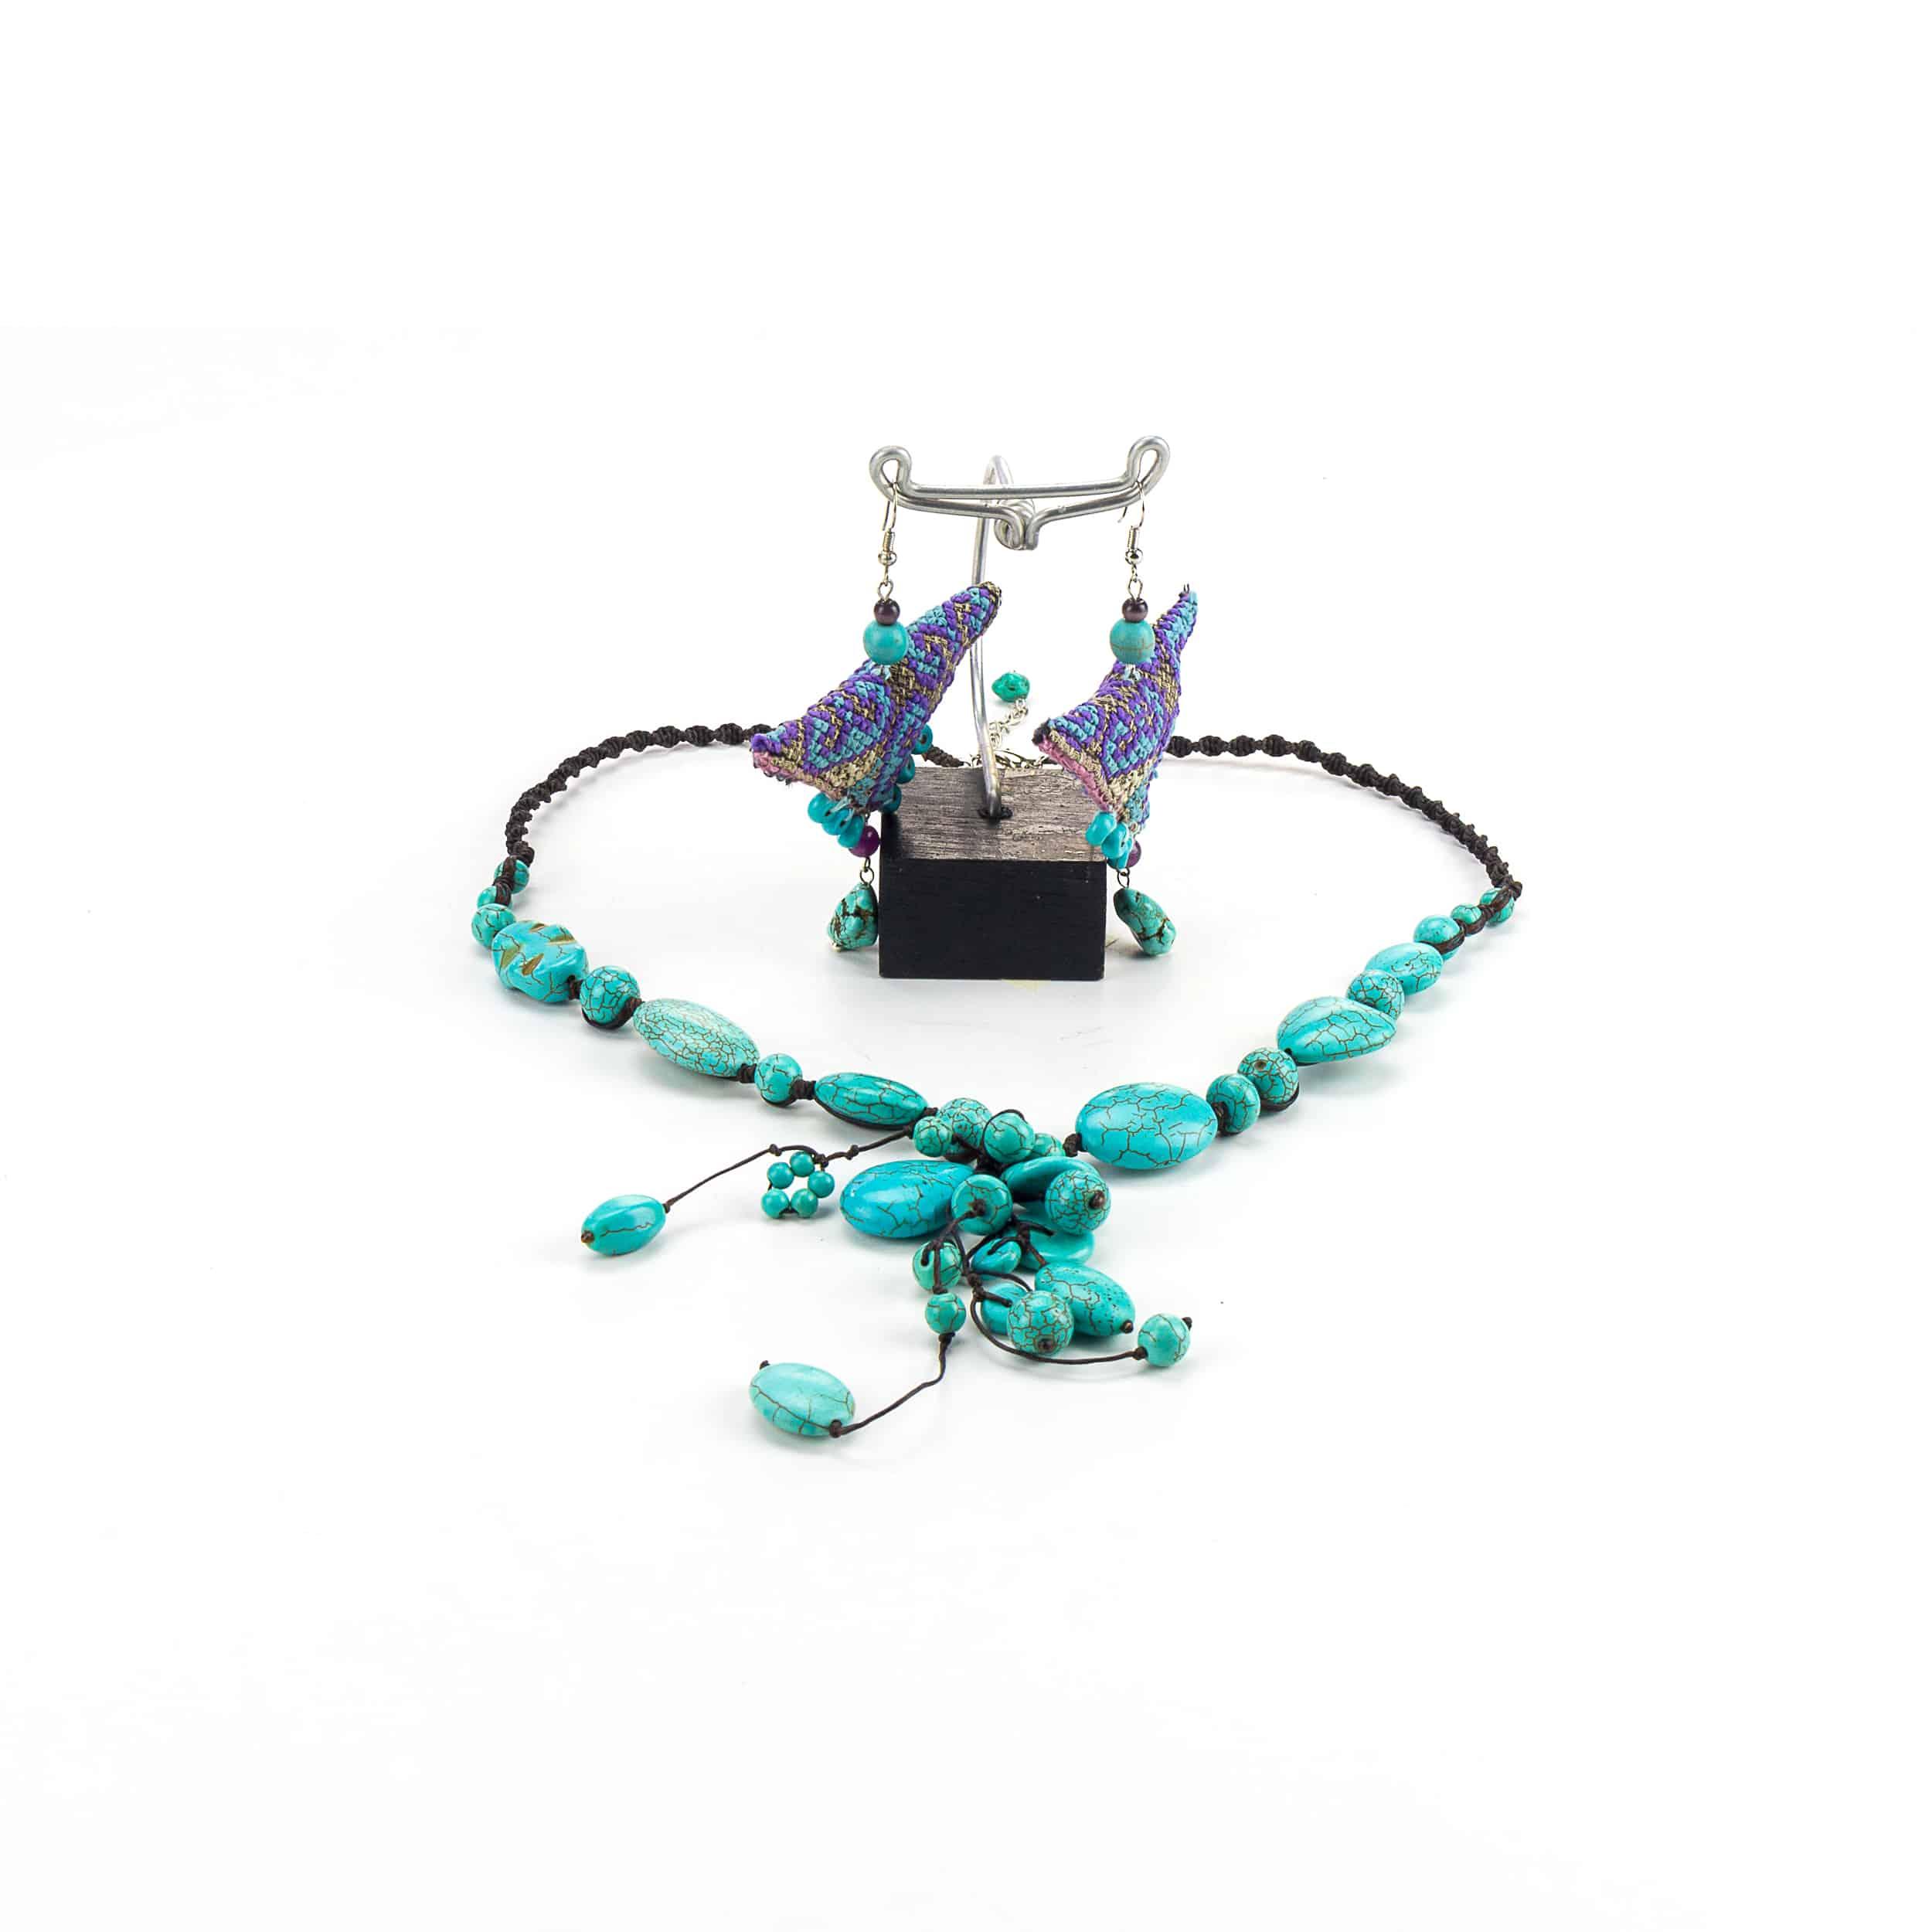 Turquoise Mania Set (เทอคอยท์มาเนียเซ็ท)